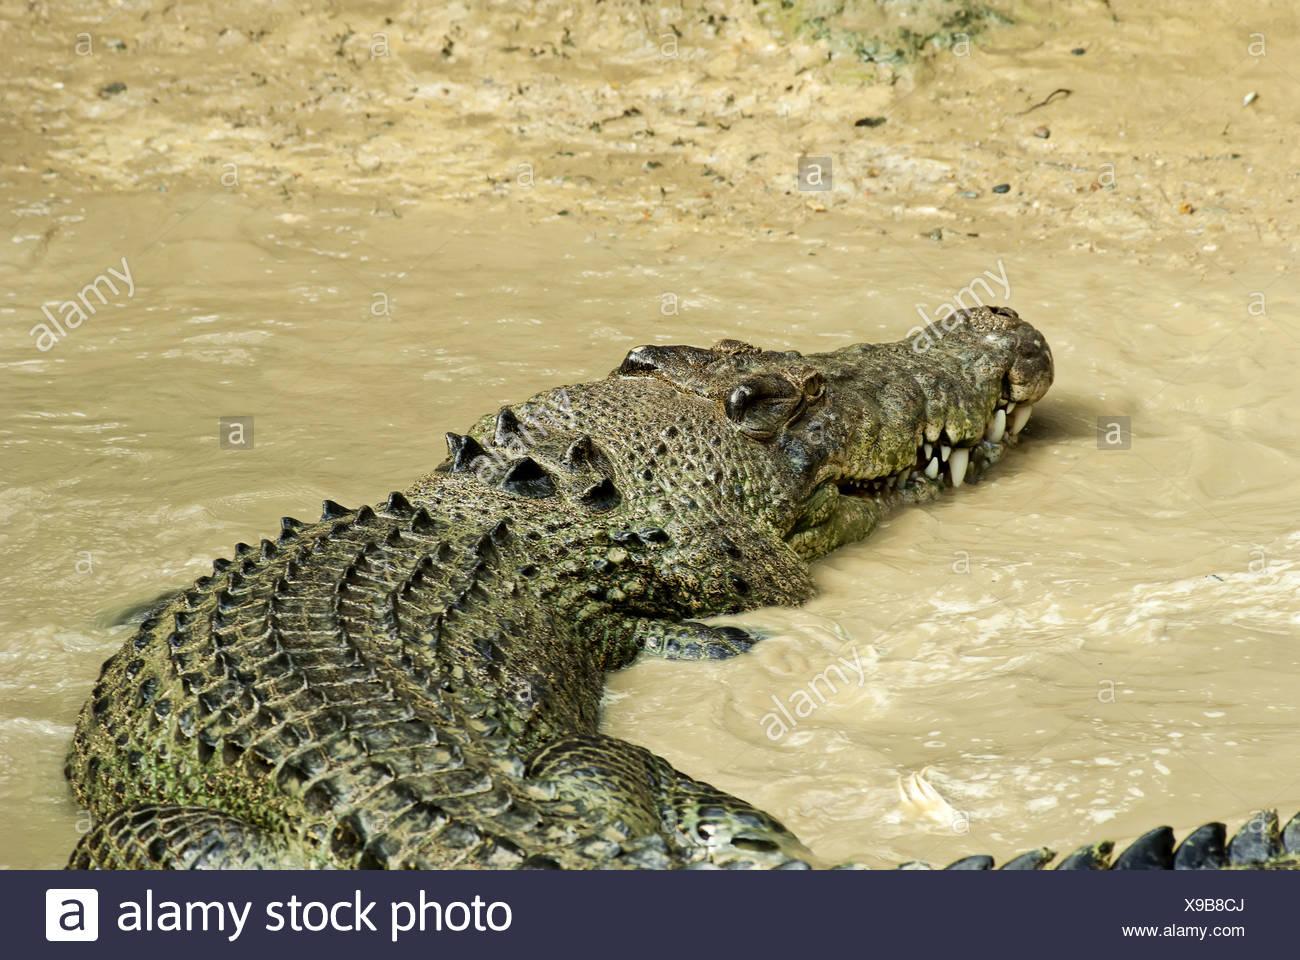 Estuarine Crocodile in agitated mud water - Stock Image